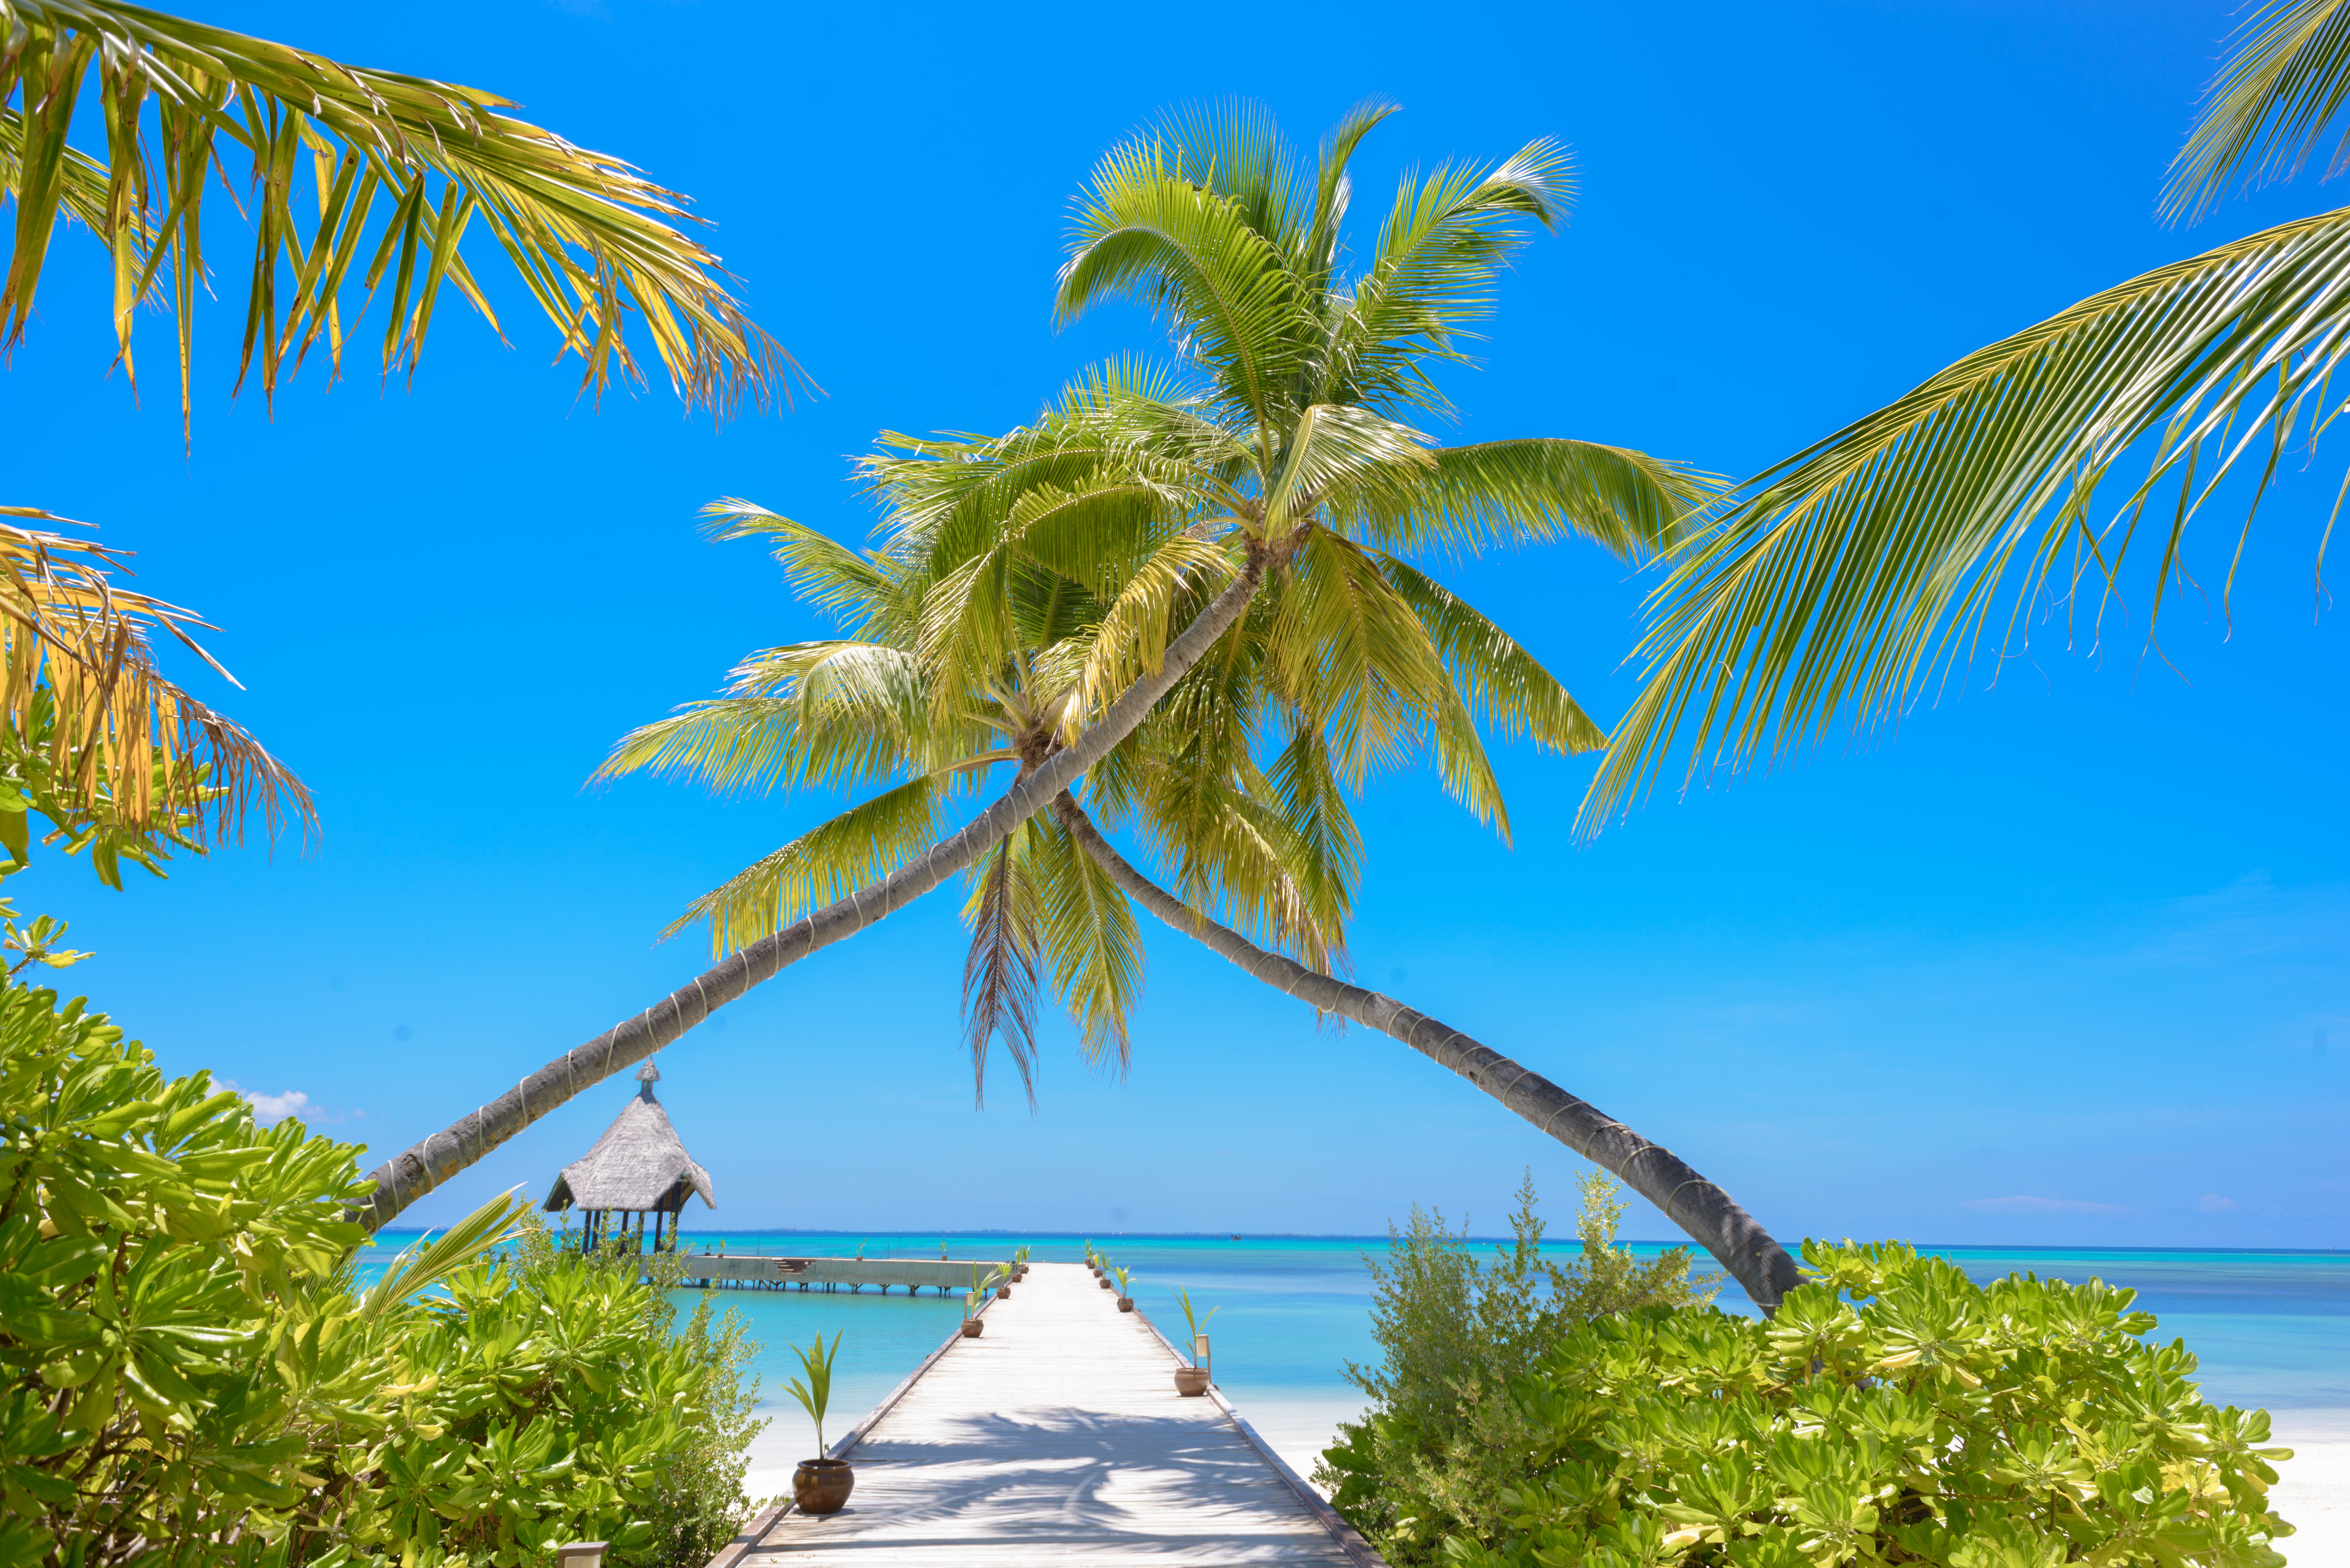 Fotobanka sbezplatnými fotkami na tému exotický, horizont, idylický, krajina pri mori